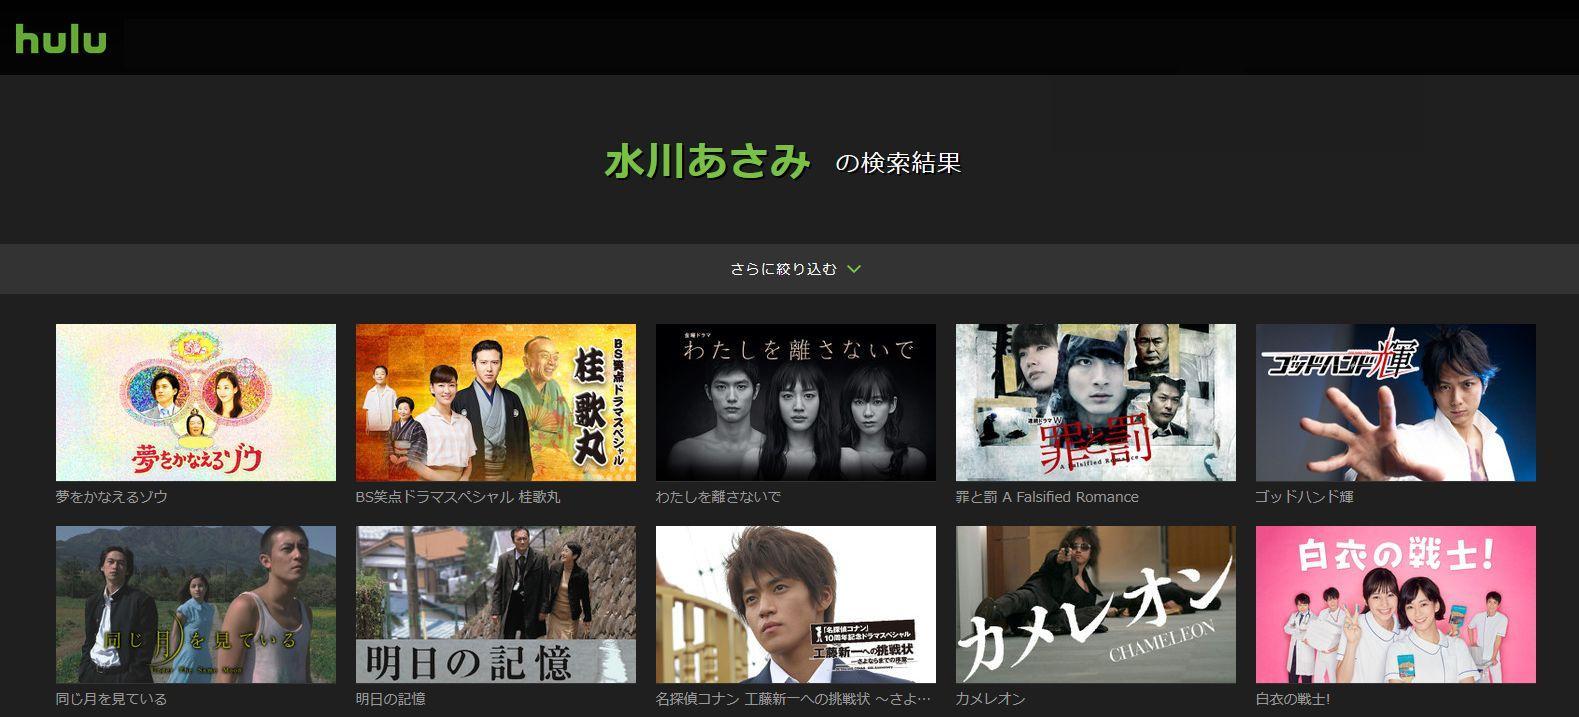 mizukawa-hulu1.jpg